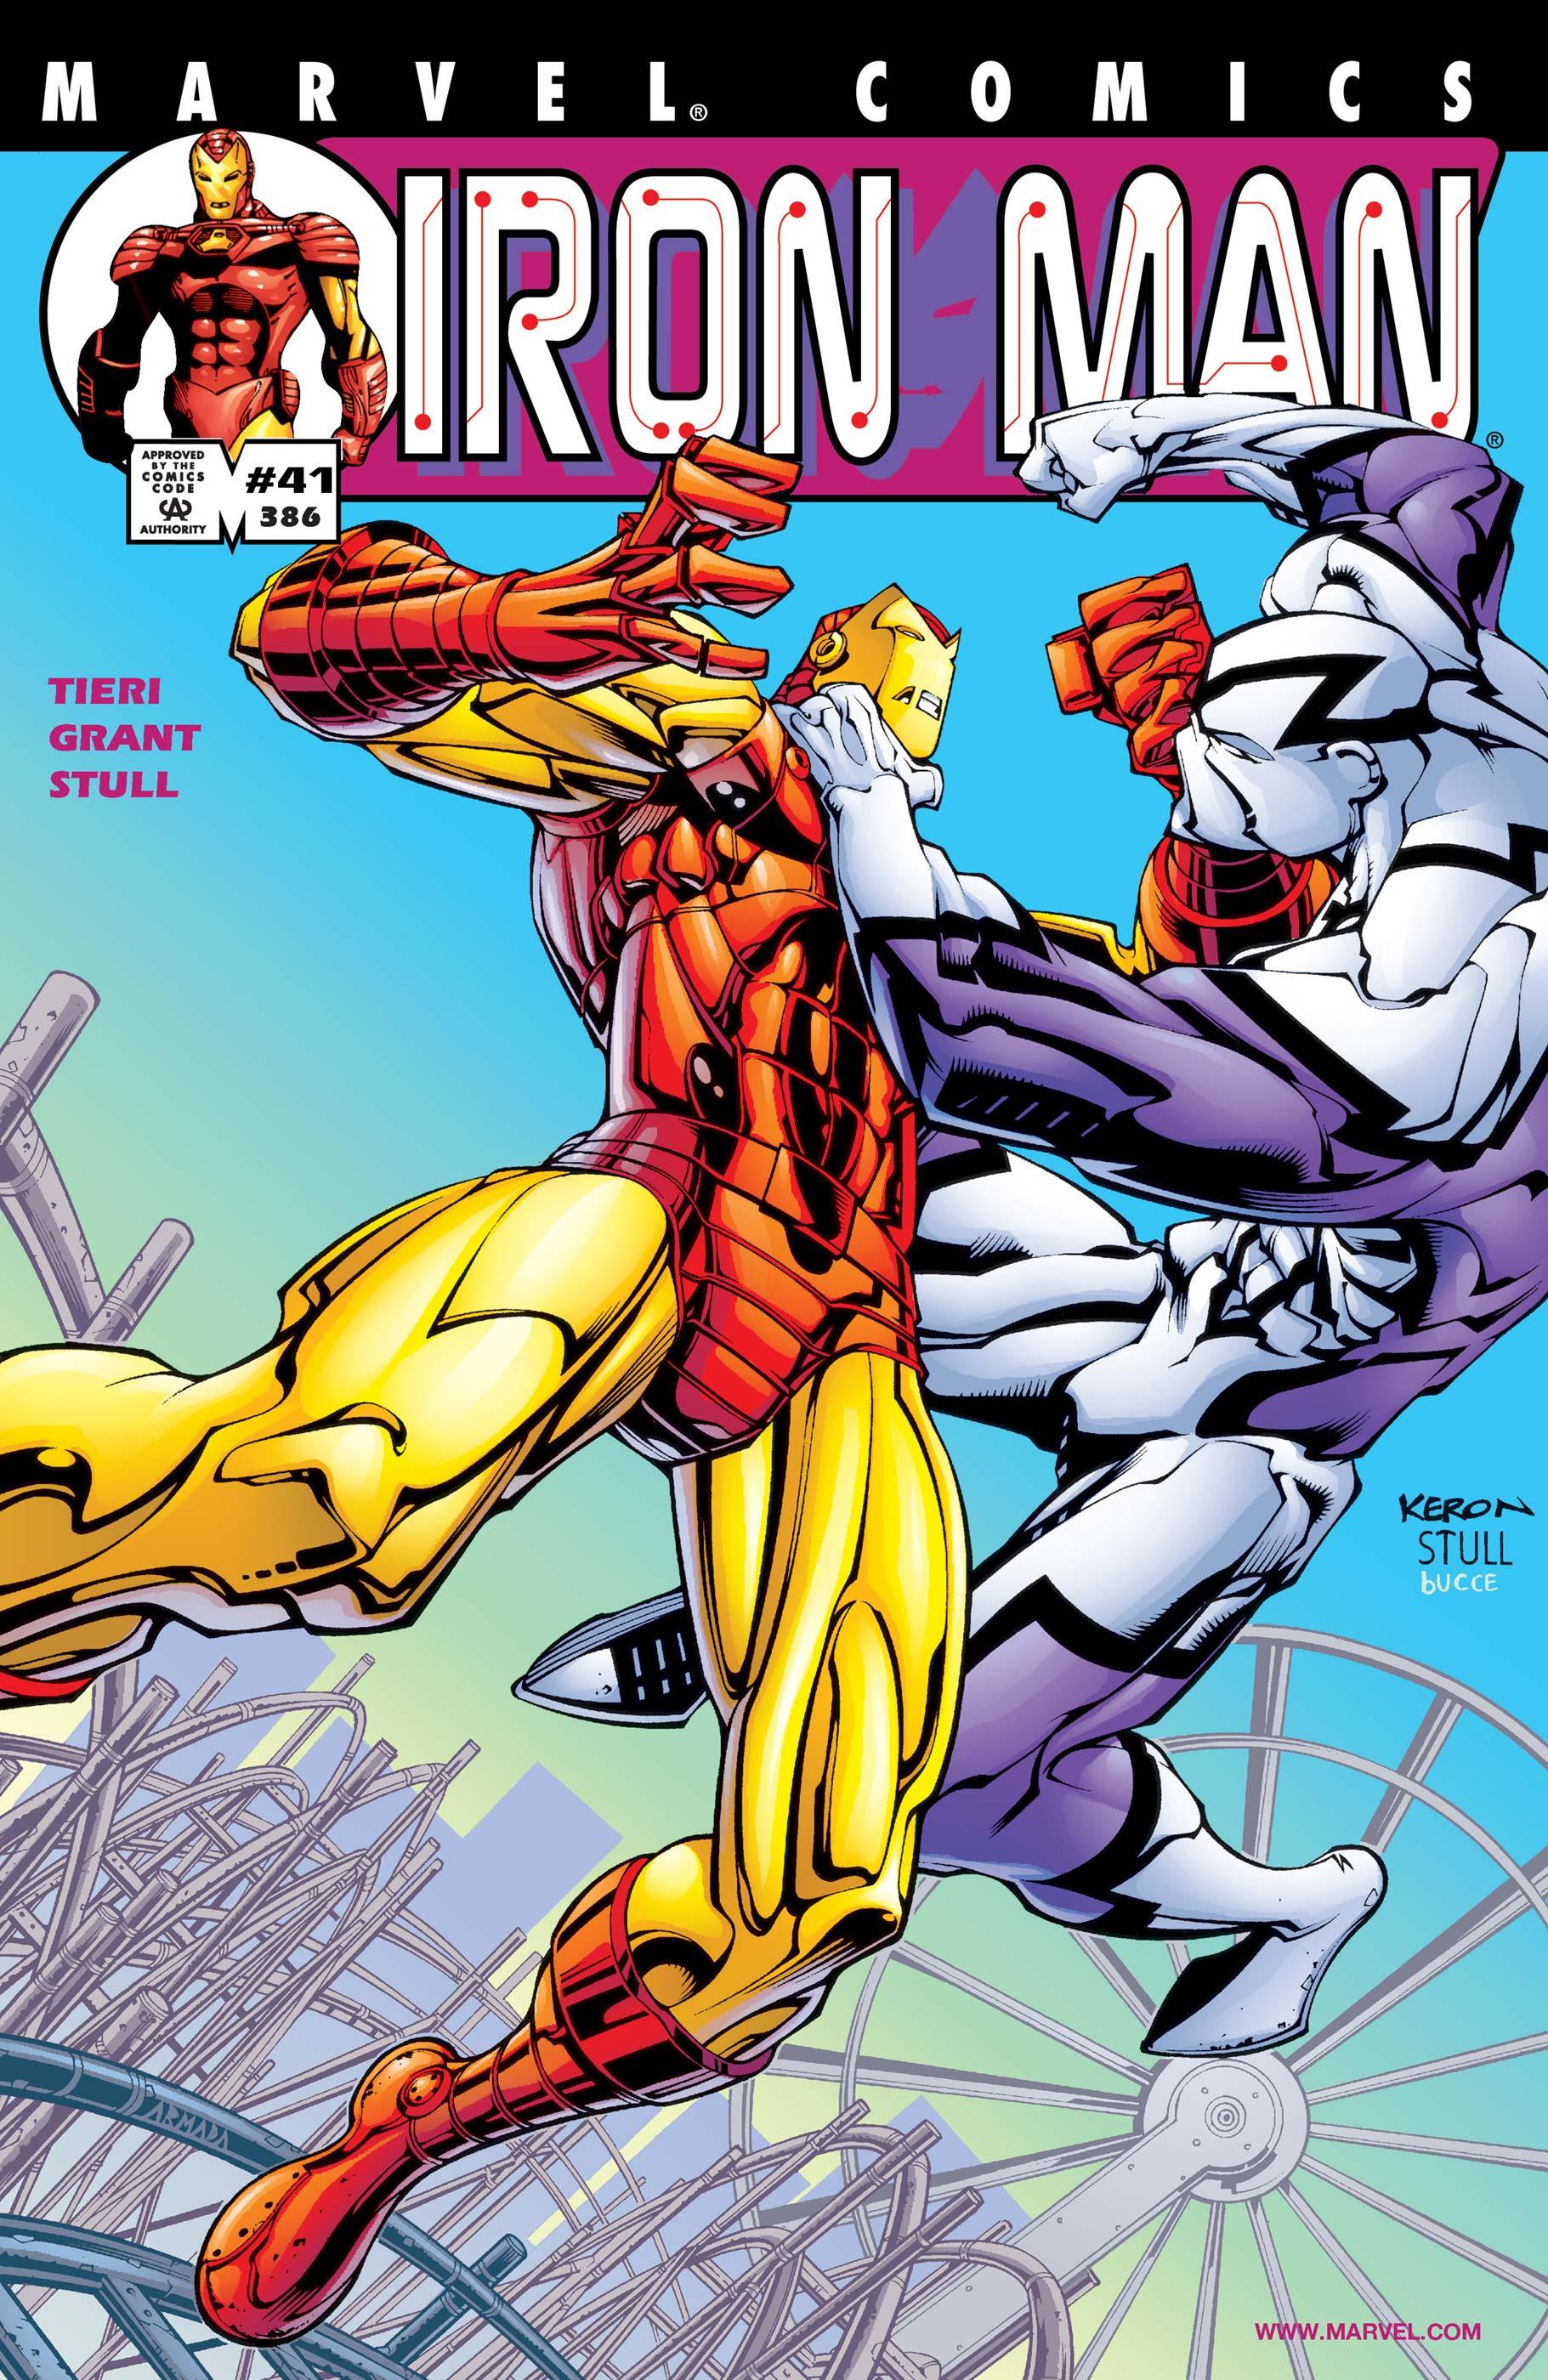 Iron Man (1998) #41